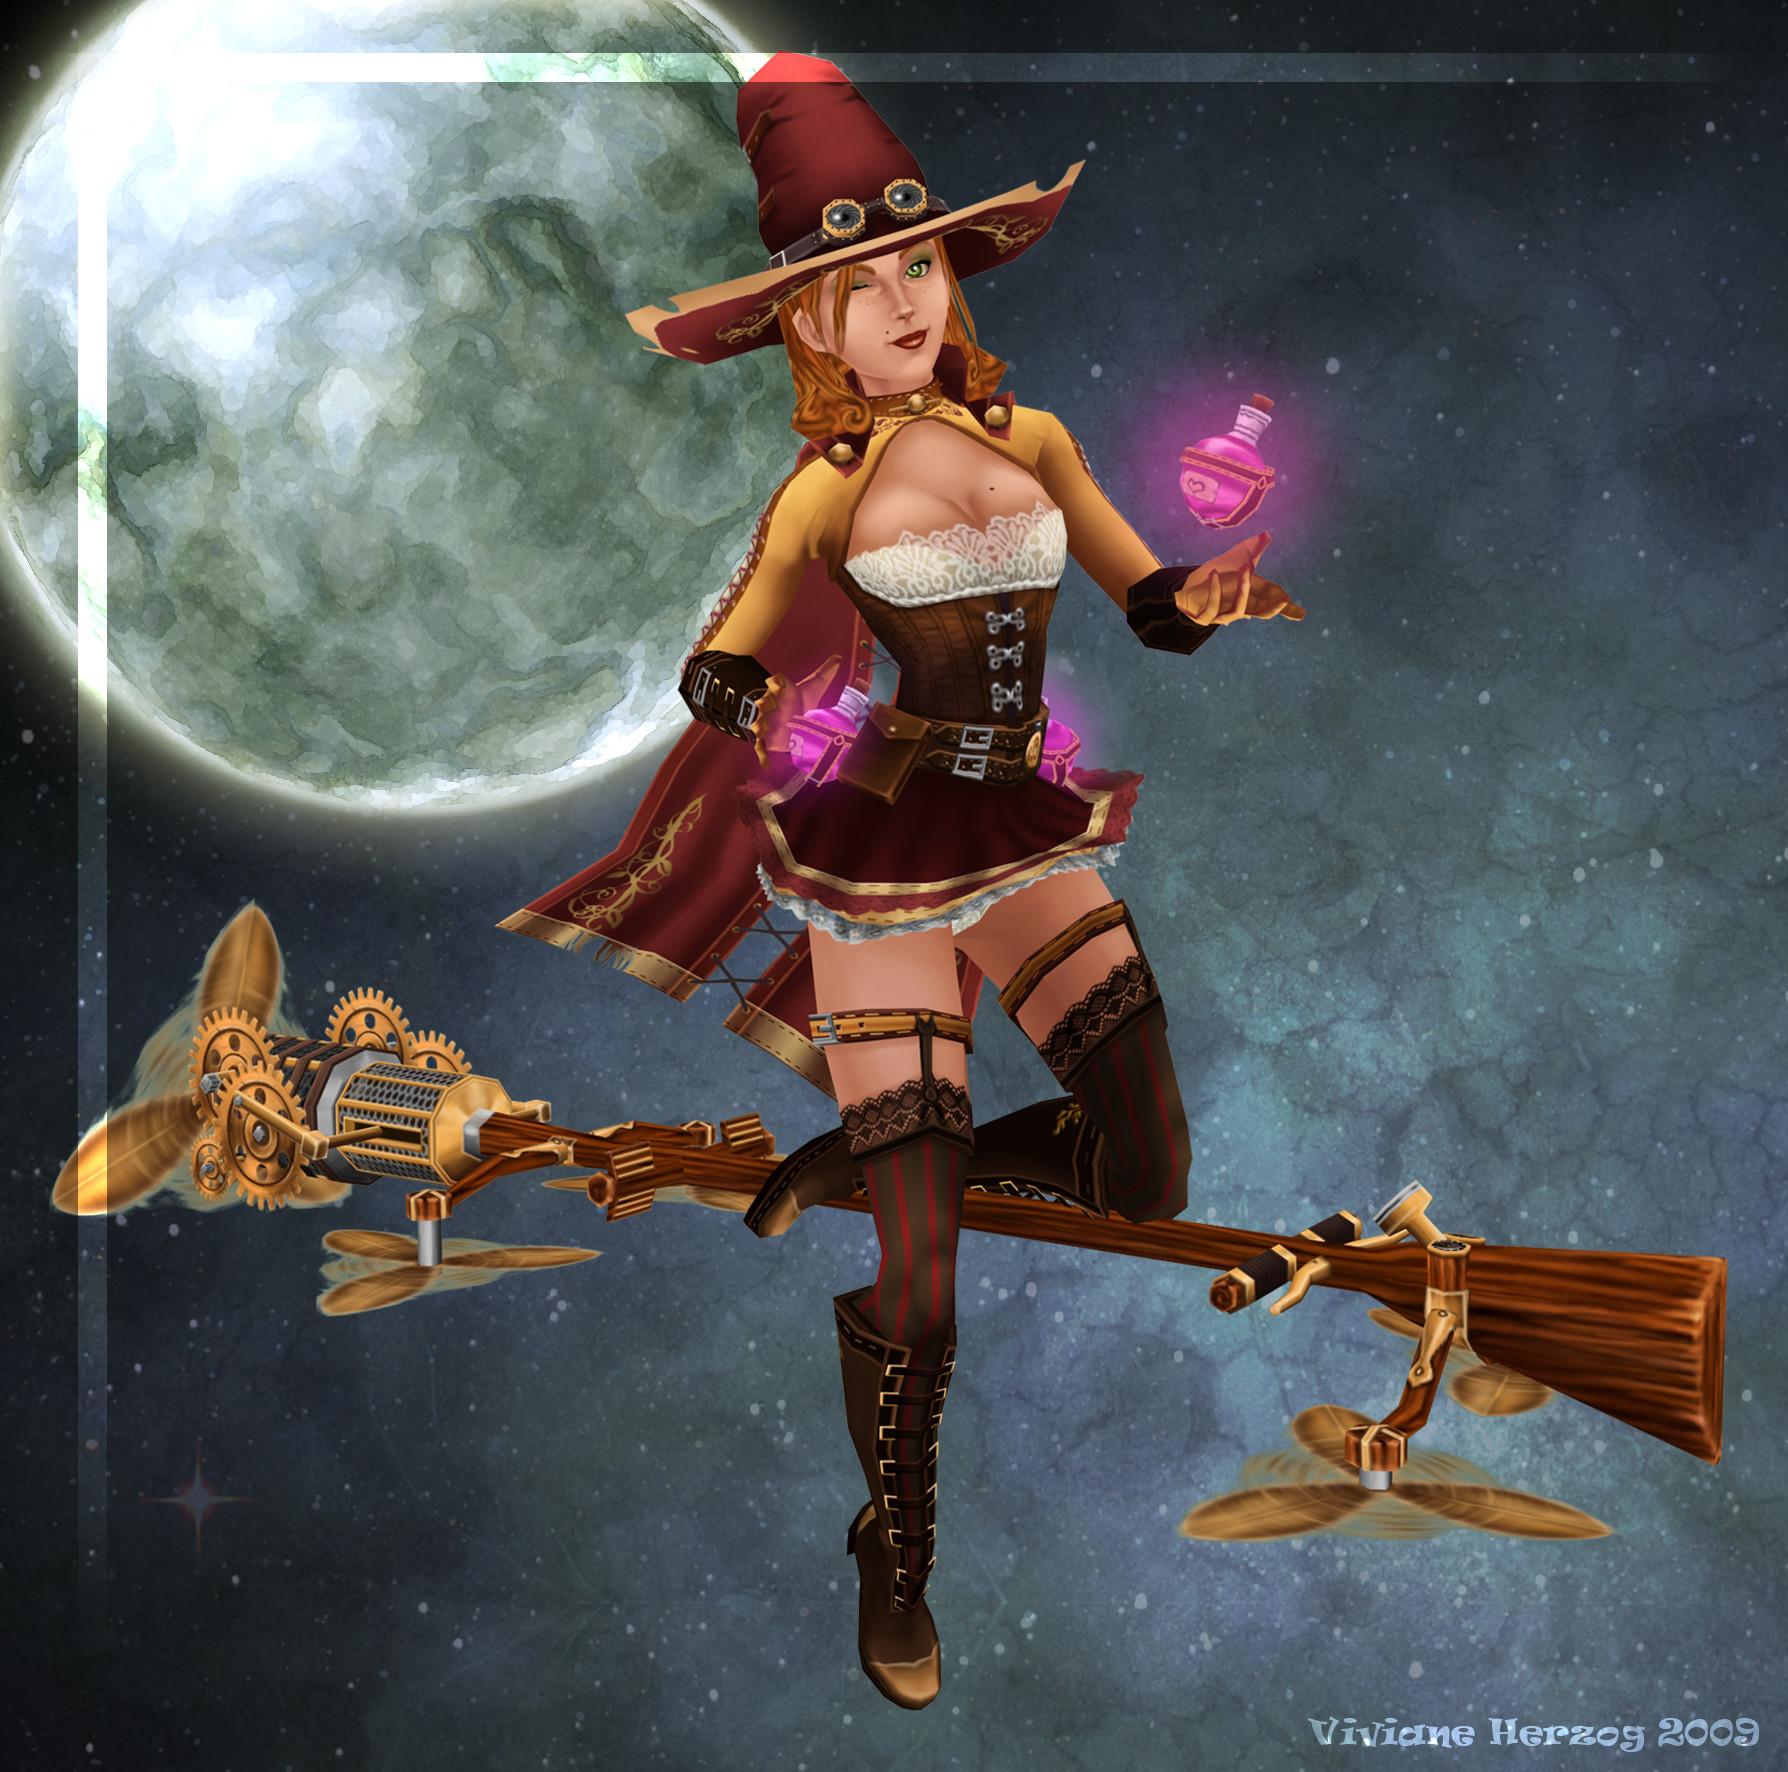 Viviane herzog witch pose